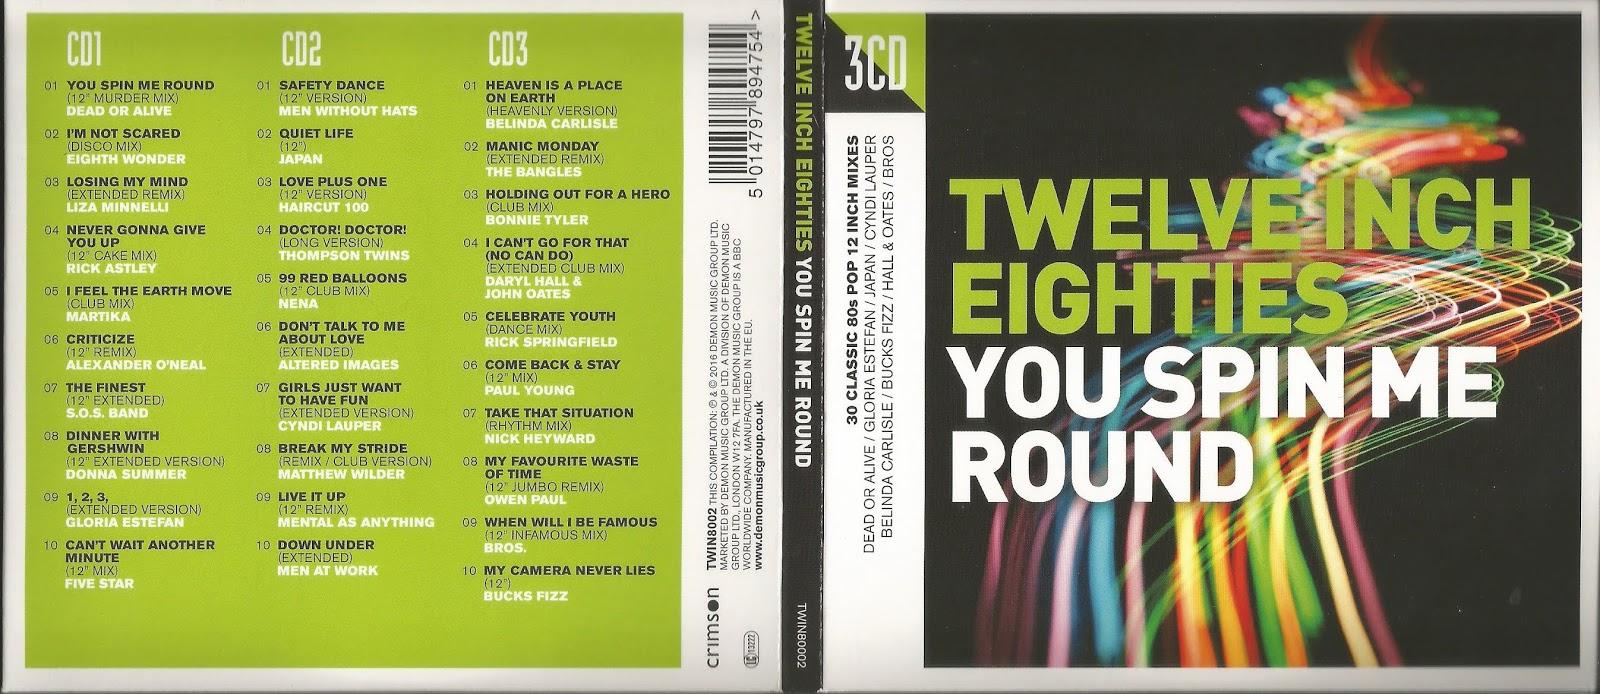 Missing Hits 7 Twelve Eighties You Spin Me Round 3 Cds Resubidos